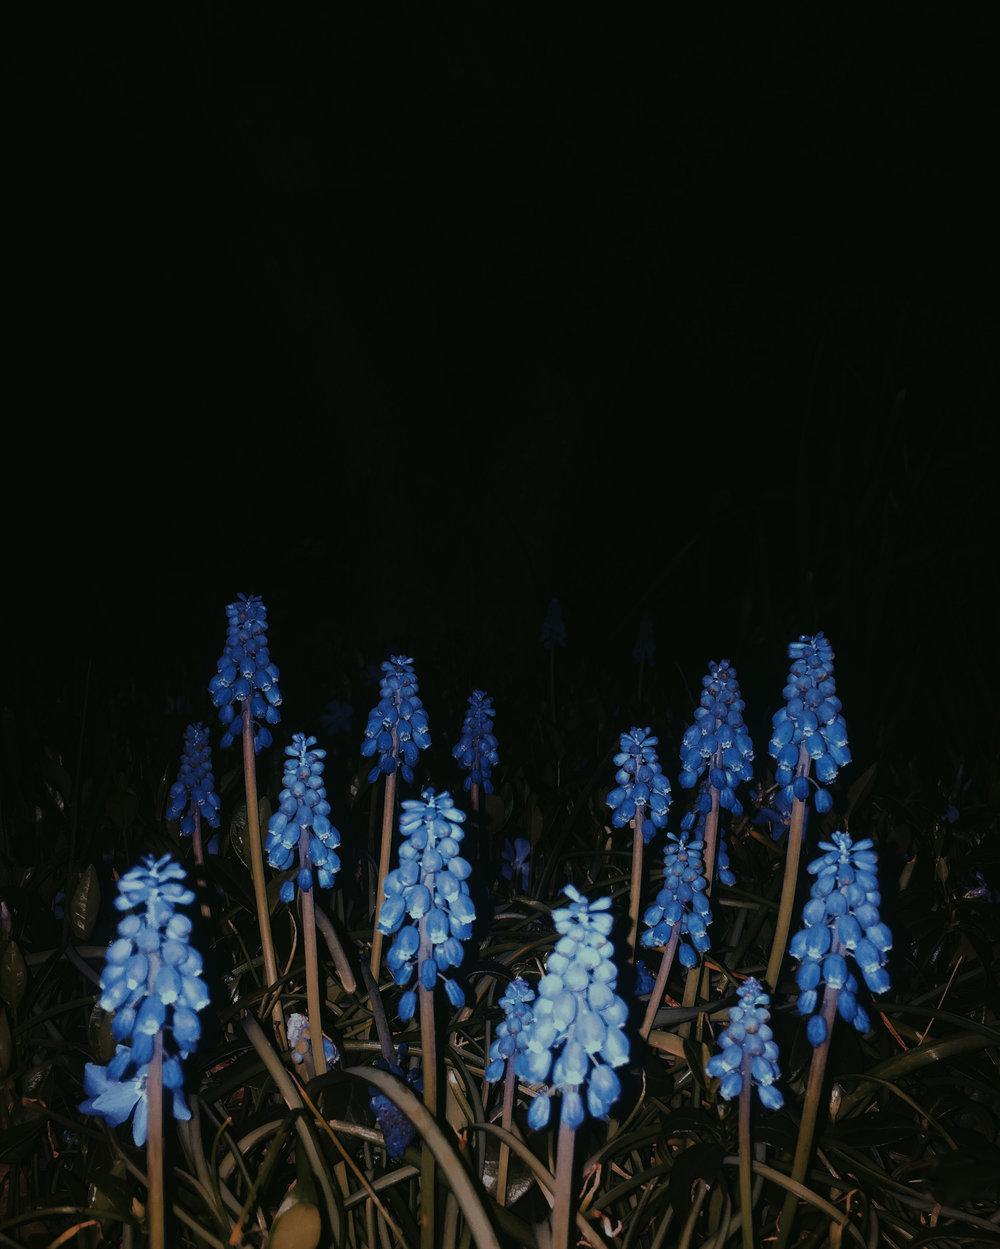 blue_flowers.jpg